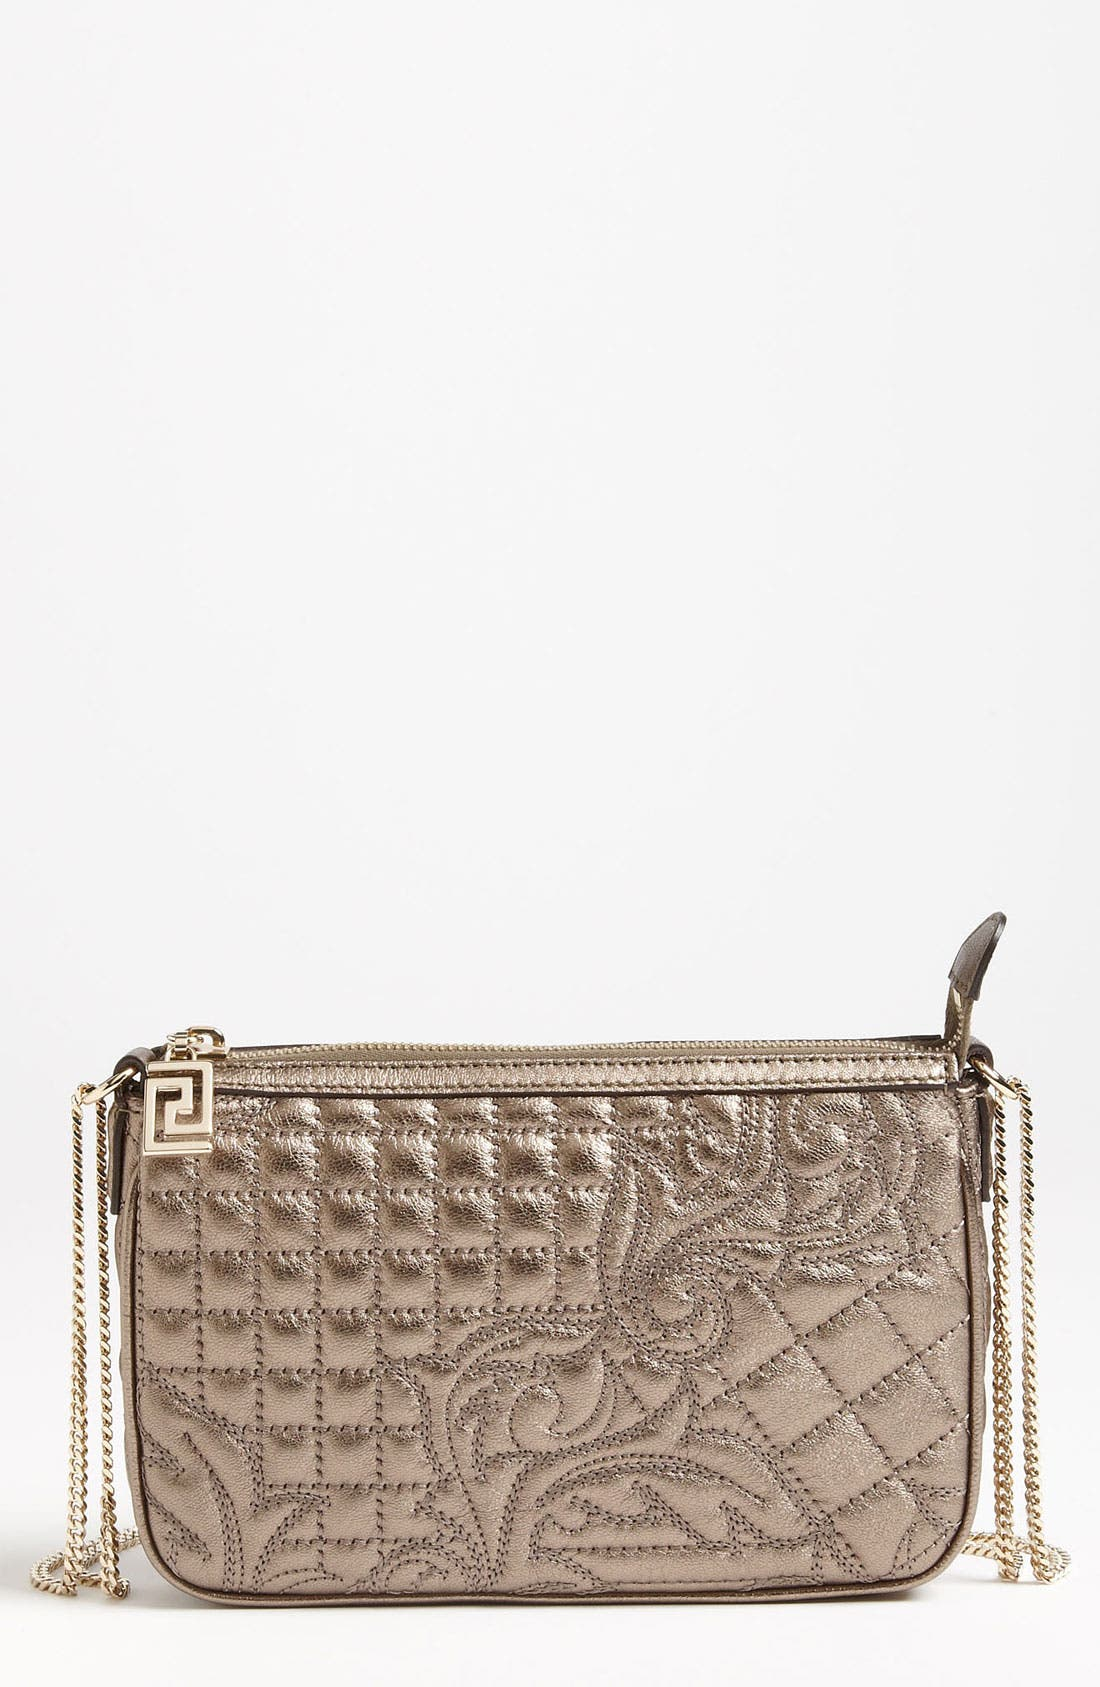 Alternate Image 1 Selected - Versace 'Vanitas' Leather Crossbody Pouchette